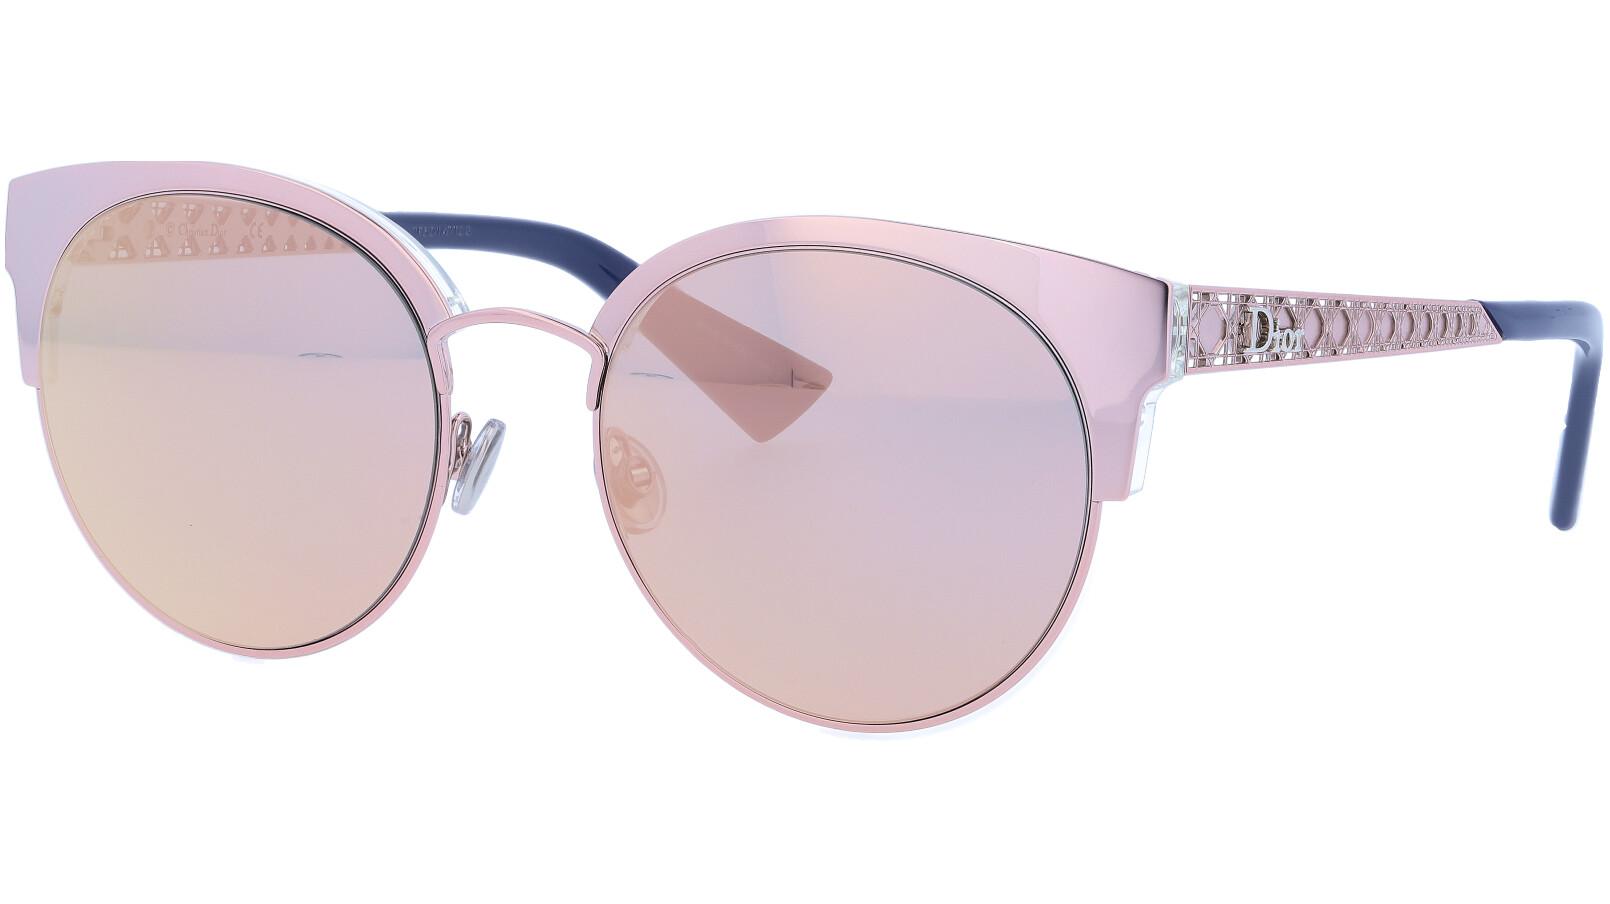 Dior ama mini S8R0J 50 LIGHT Sunglasses